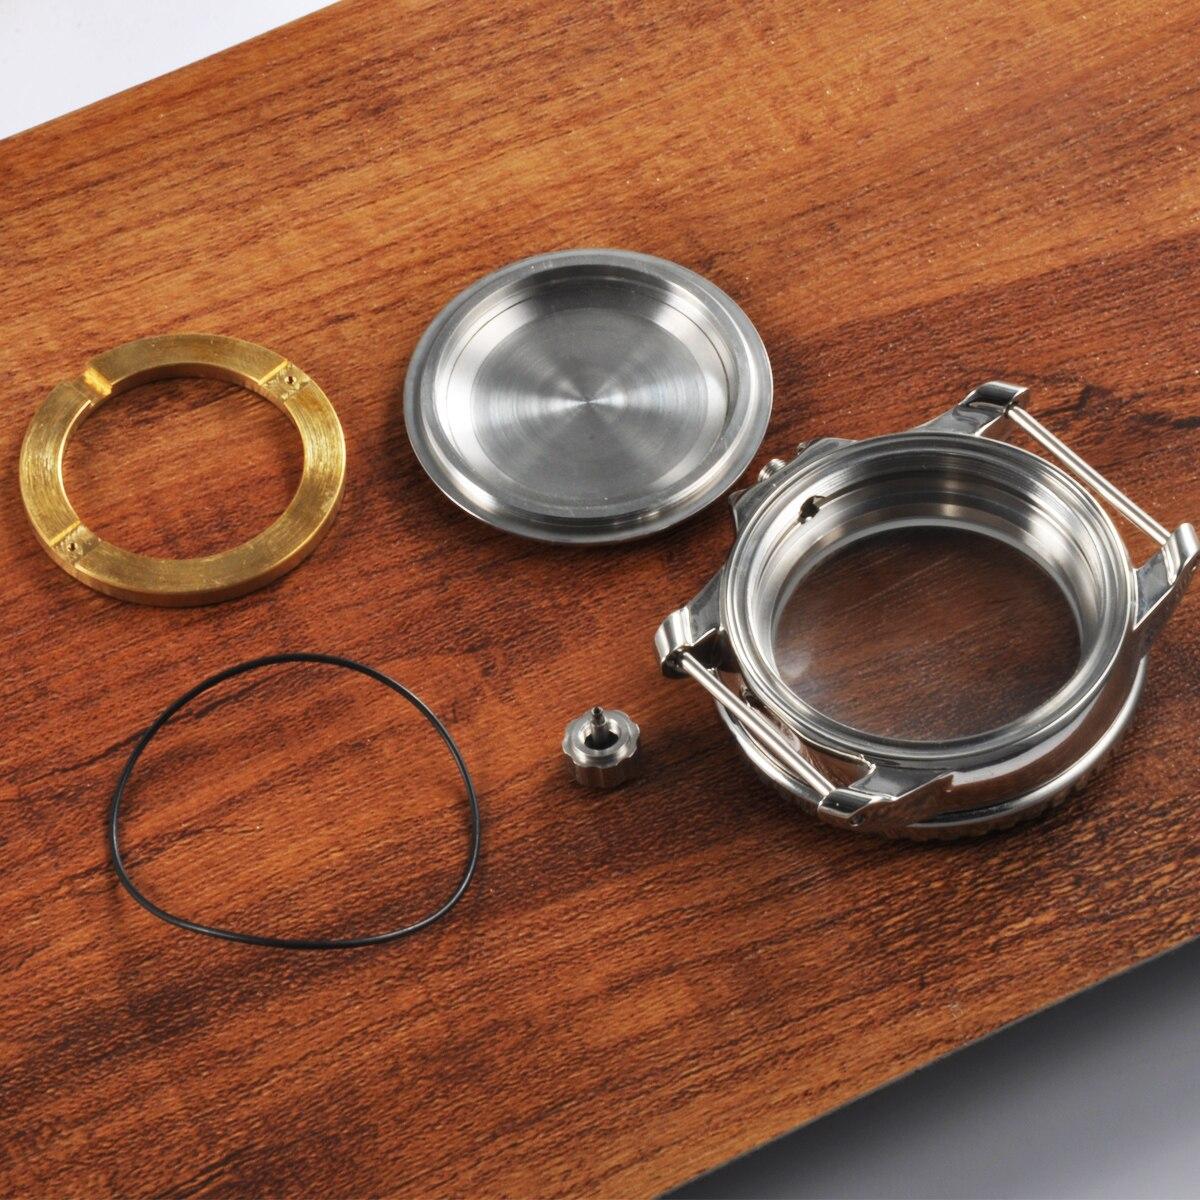 Corgeut 45mm relógio masculino asséptico caso ajuste